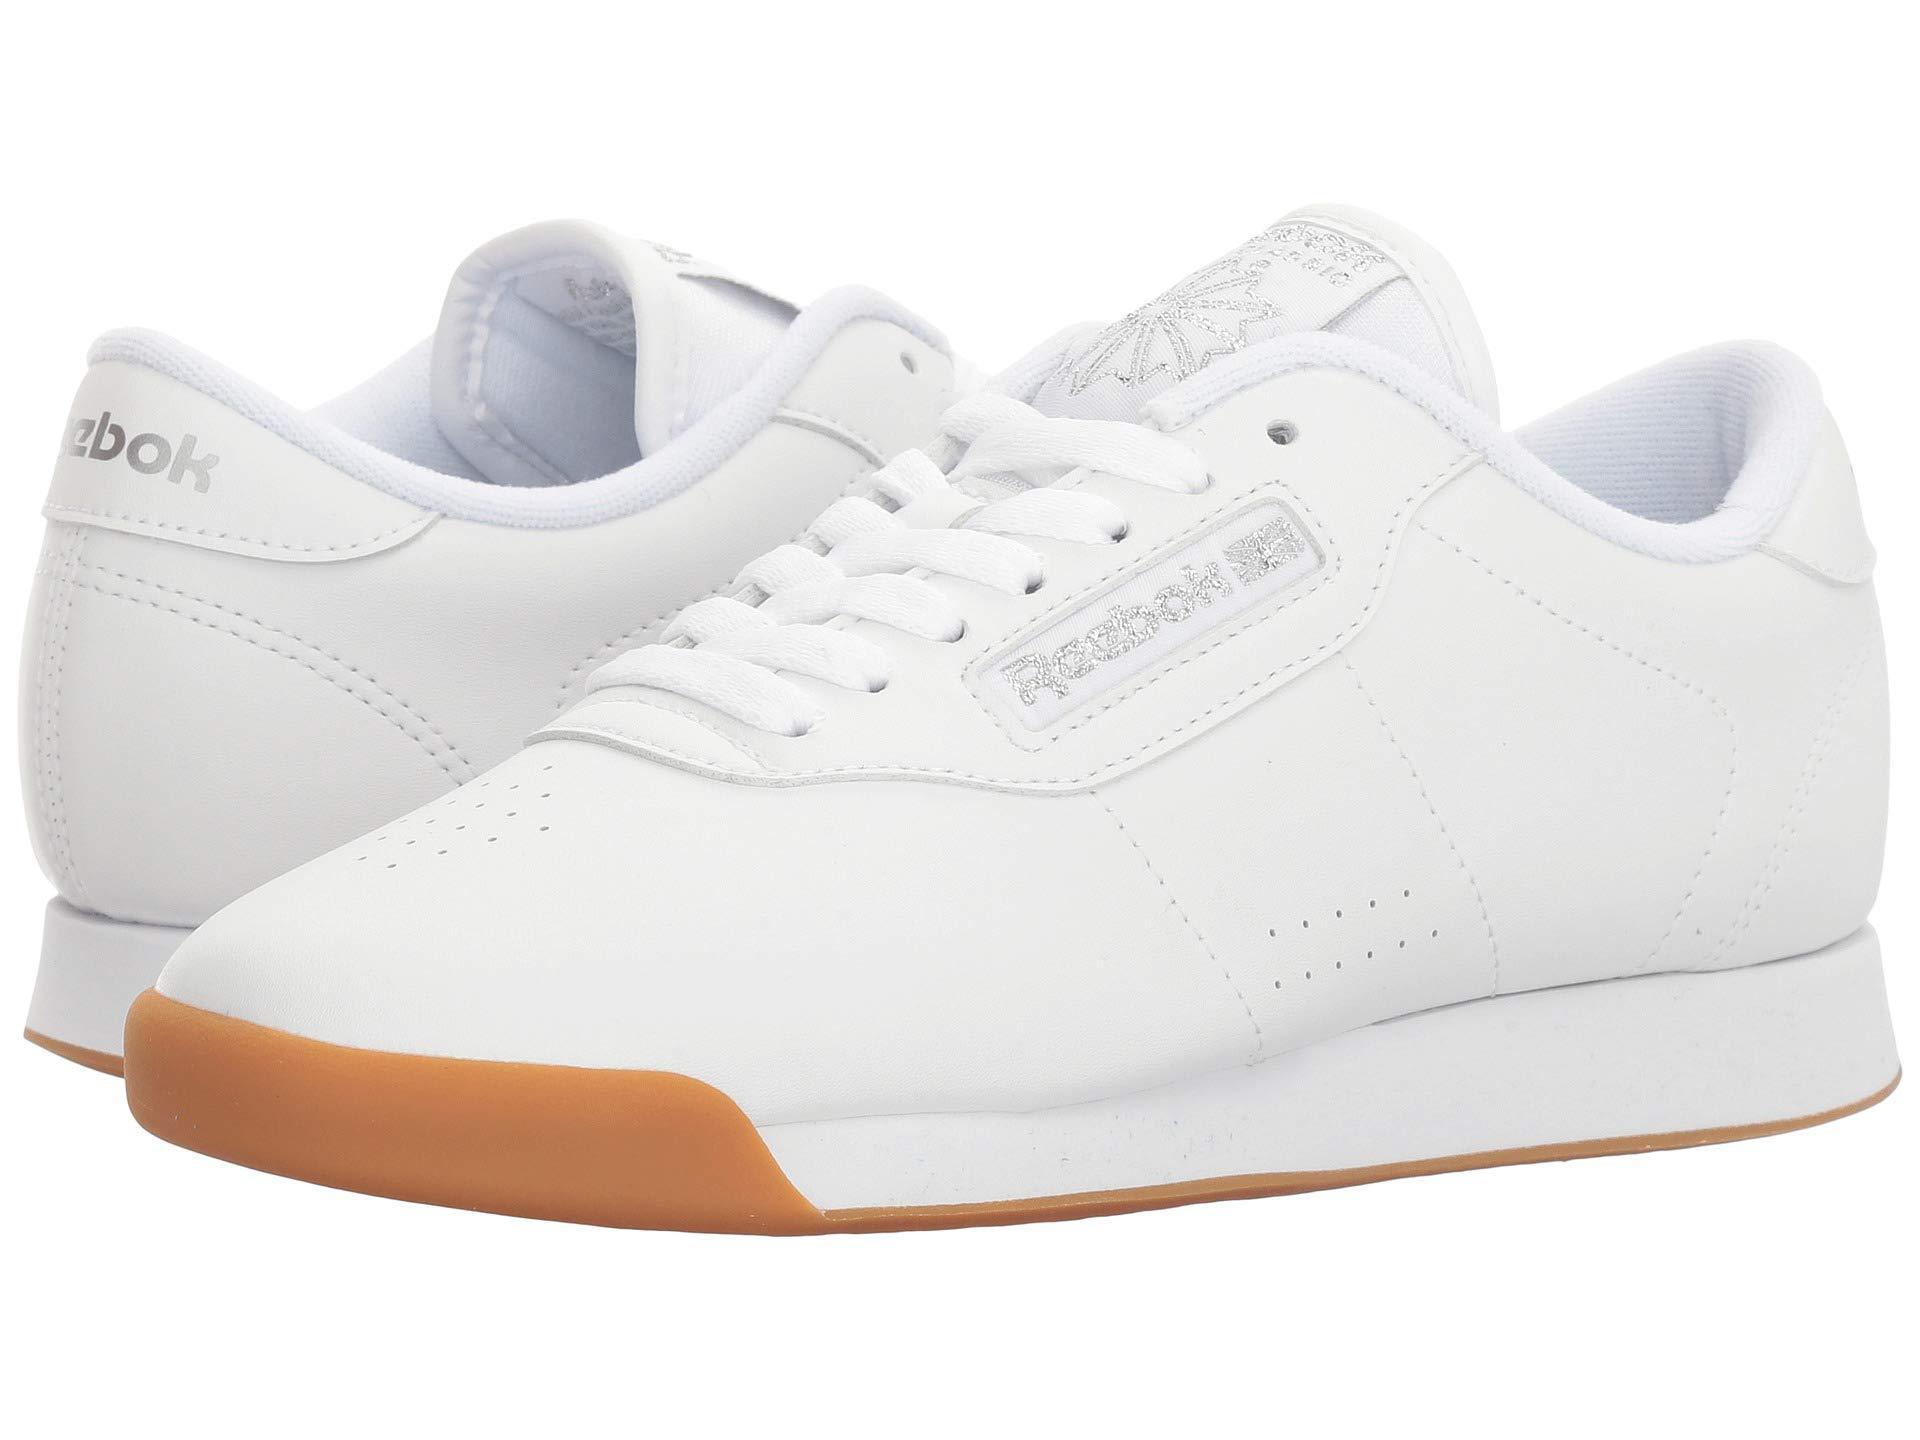 Lyst - Reebok Princess (black gum) Women s Shoes in White 1a448fc1c